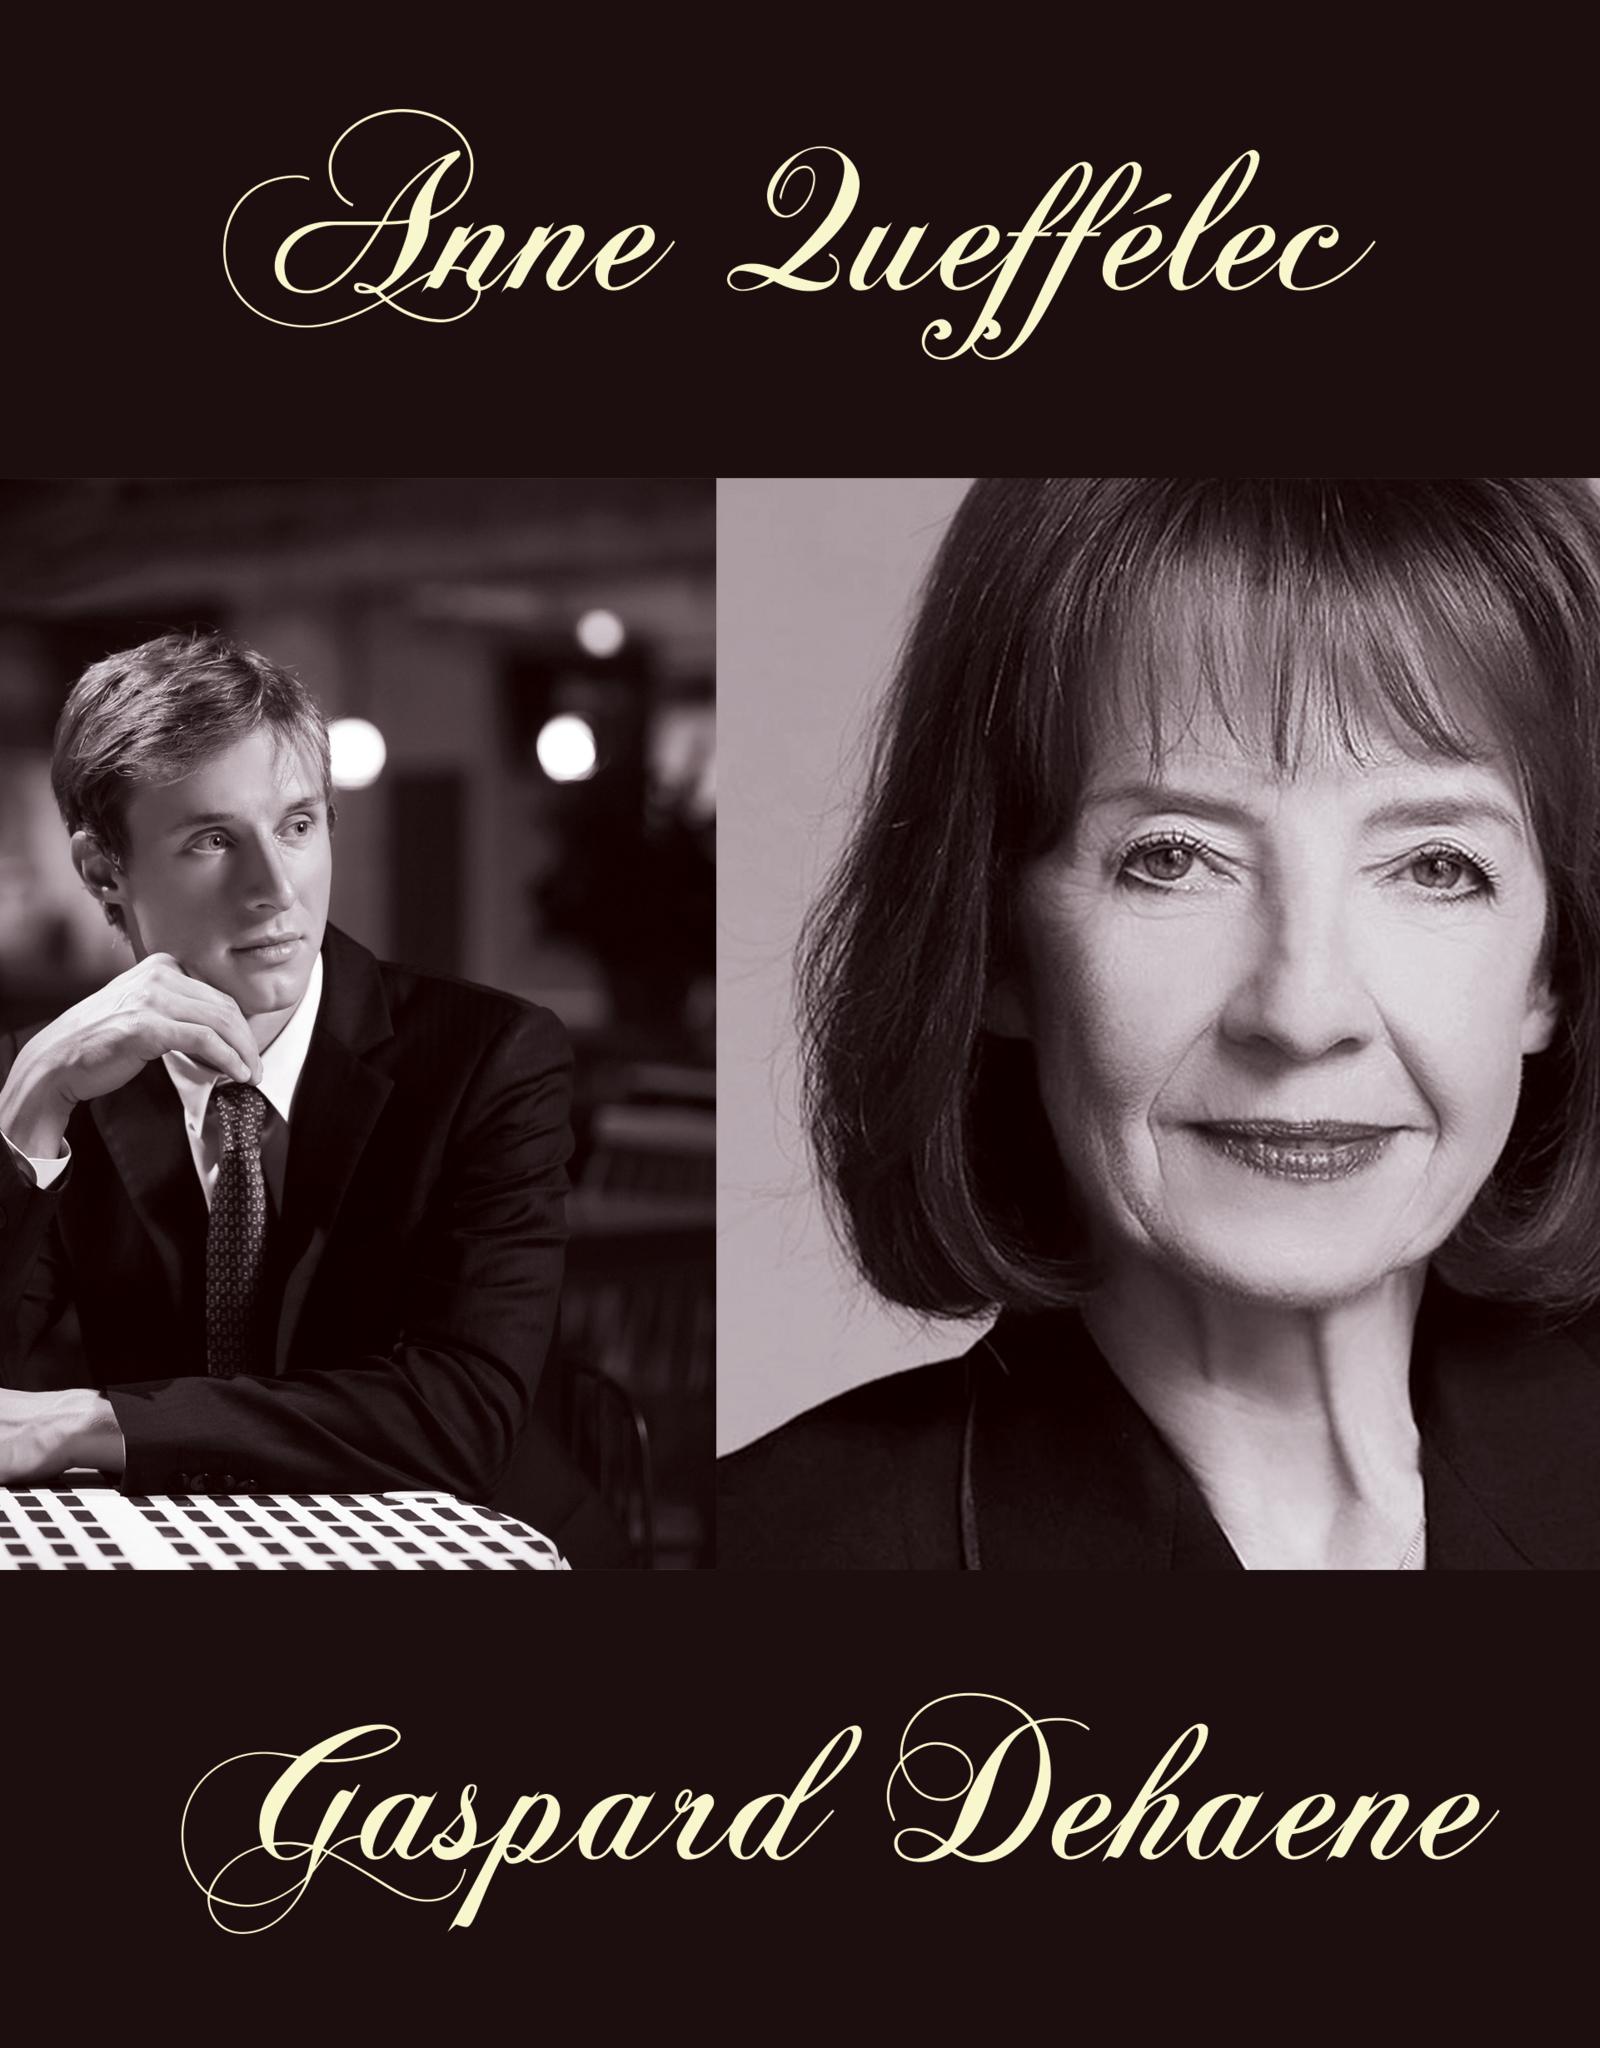 Concert Anne Queffélec & Gaspard Dehaene 28/11/2020